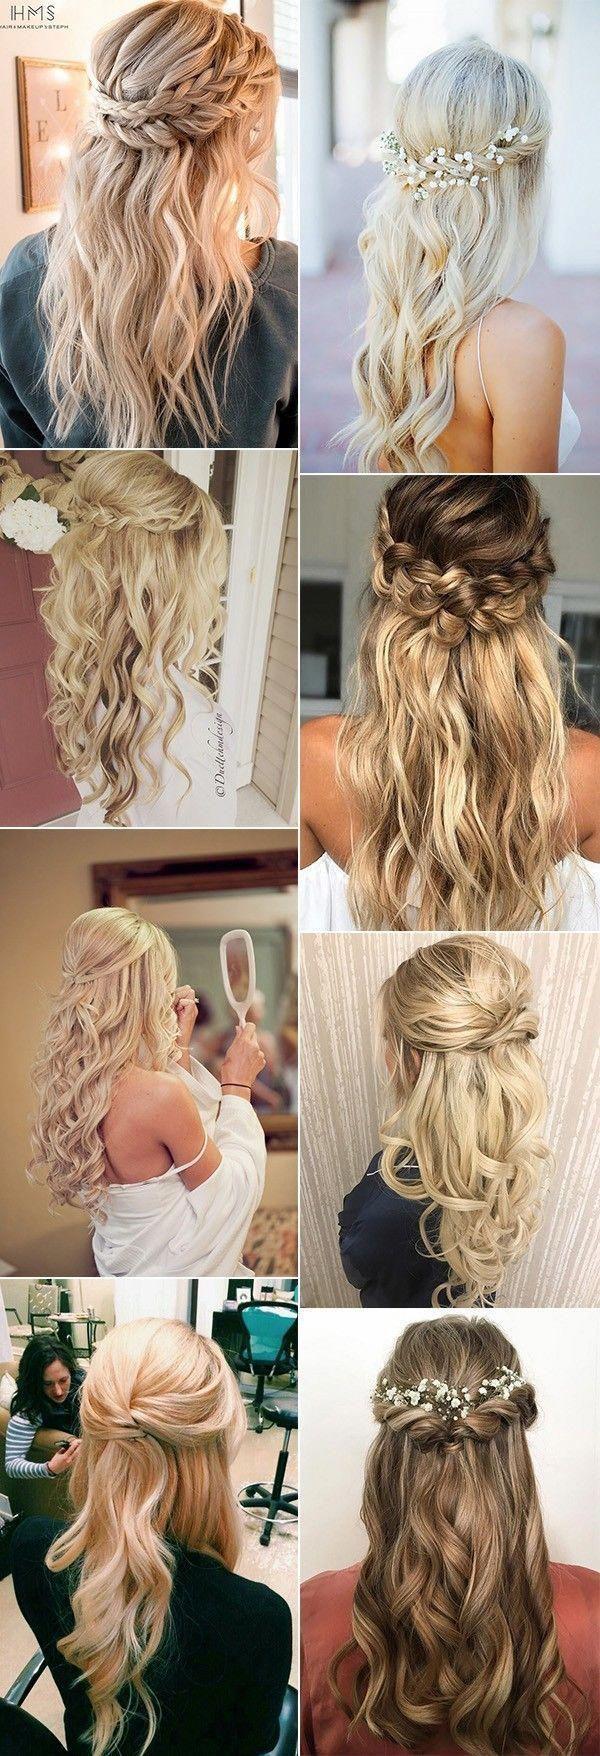 chic half high half down wedding hairstyle ideas #formalhairstyles – formal …, #Chic #Form …